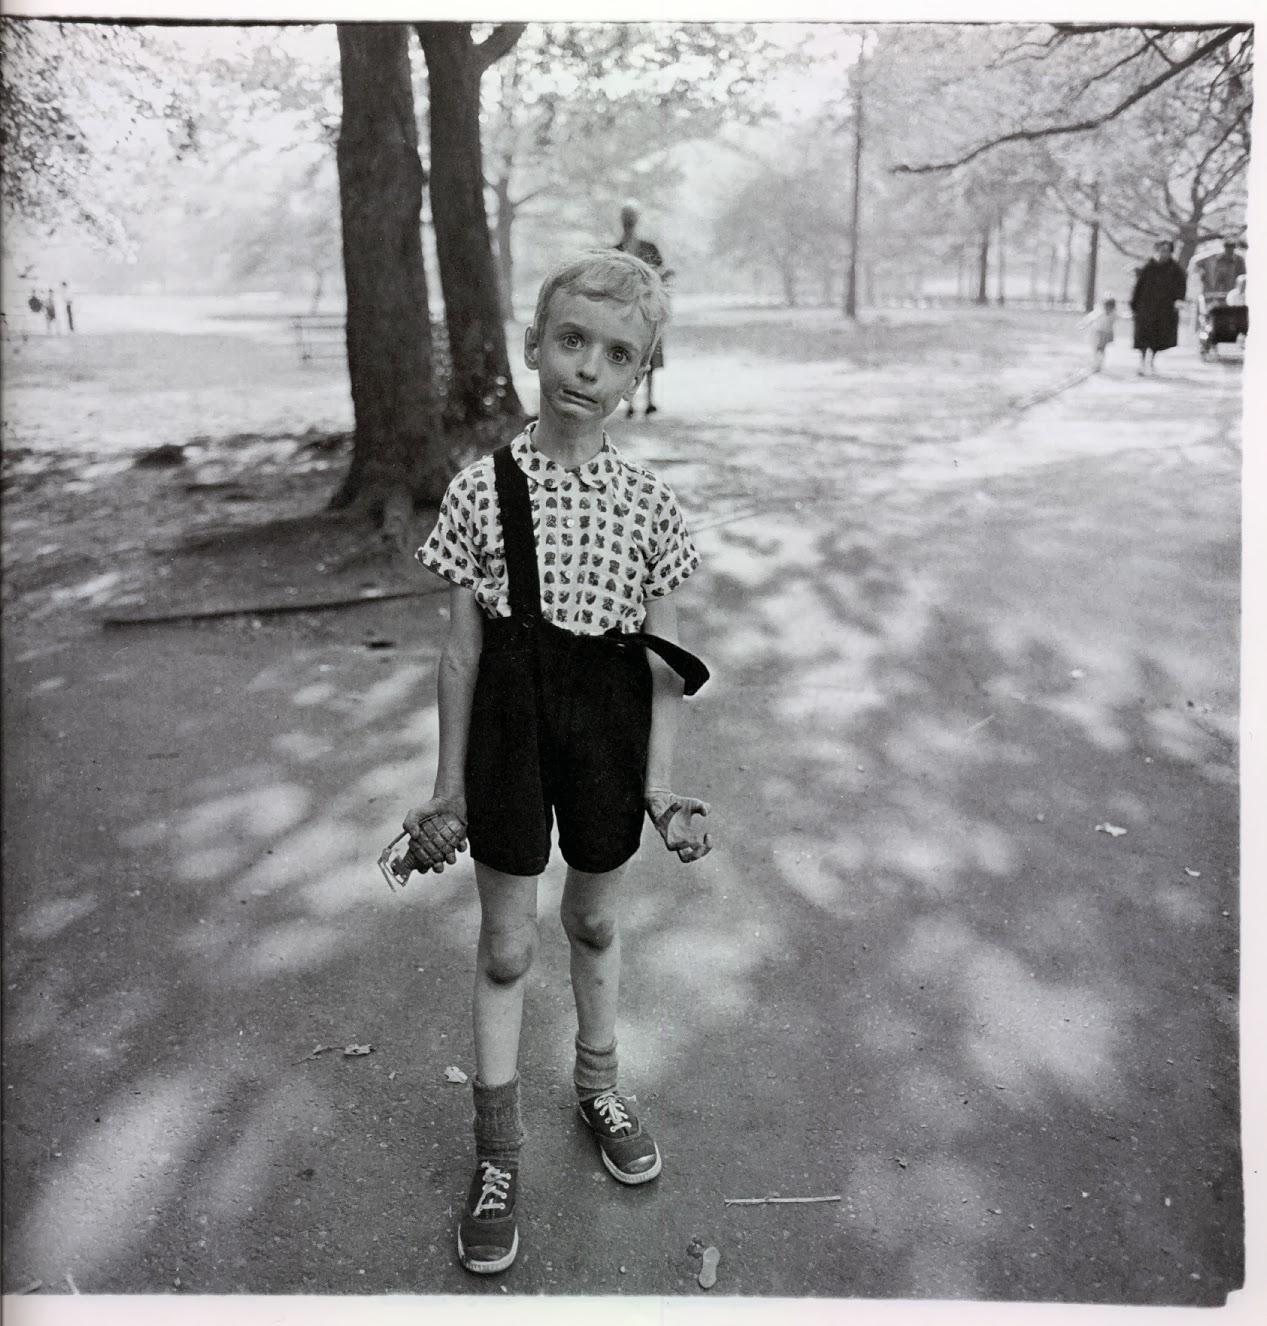 Dečak sa ručnom granatom u Central Parku, 1962